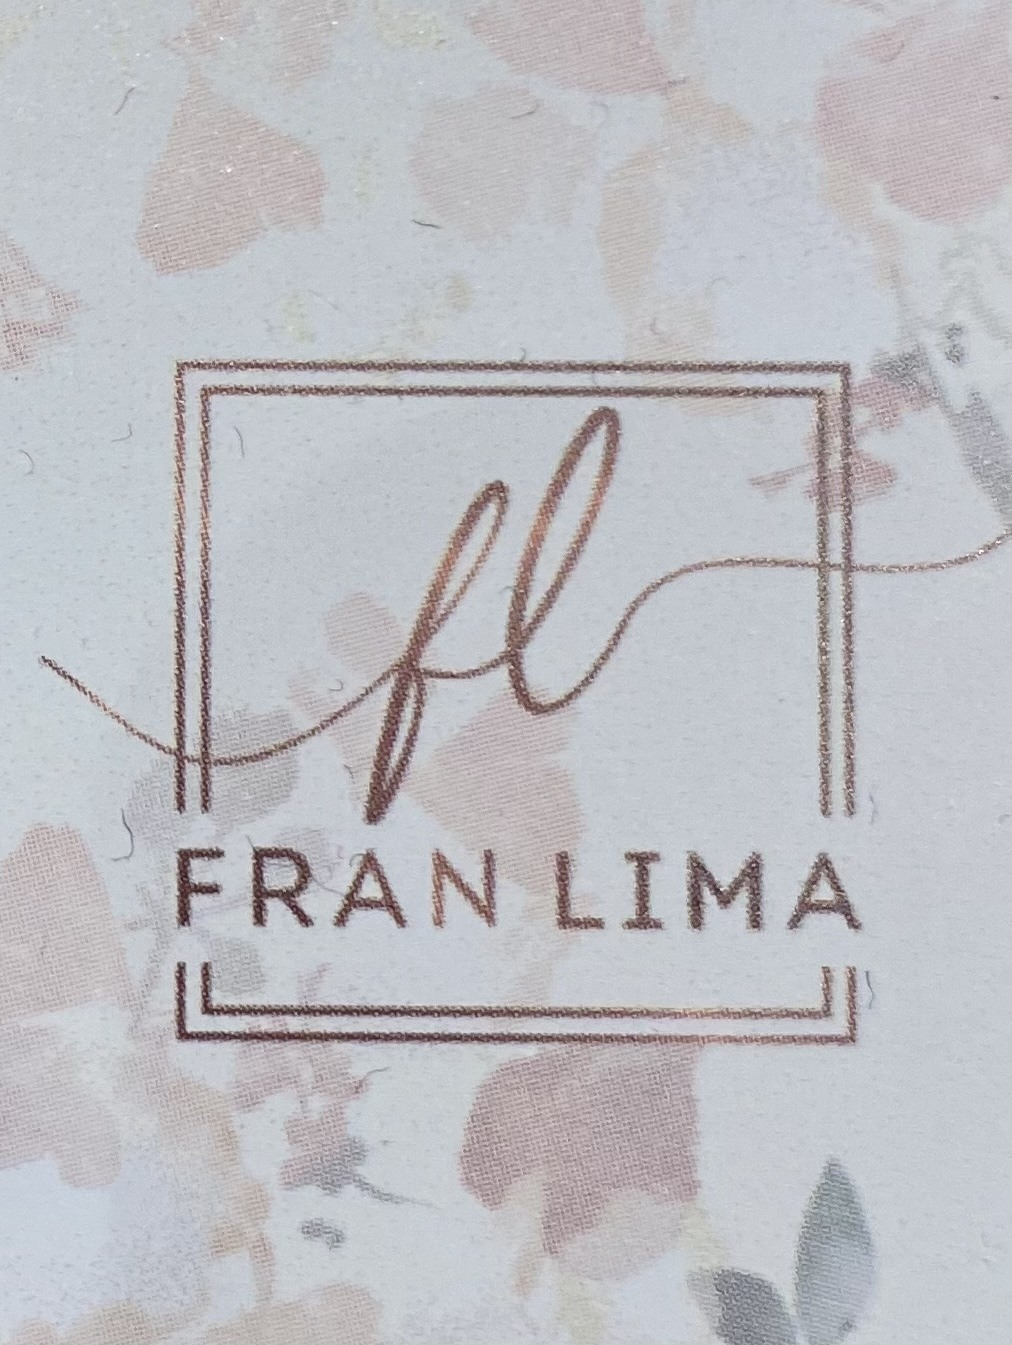 Fran Lima